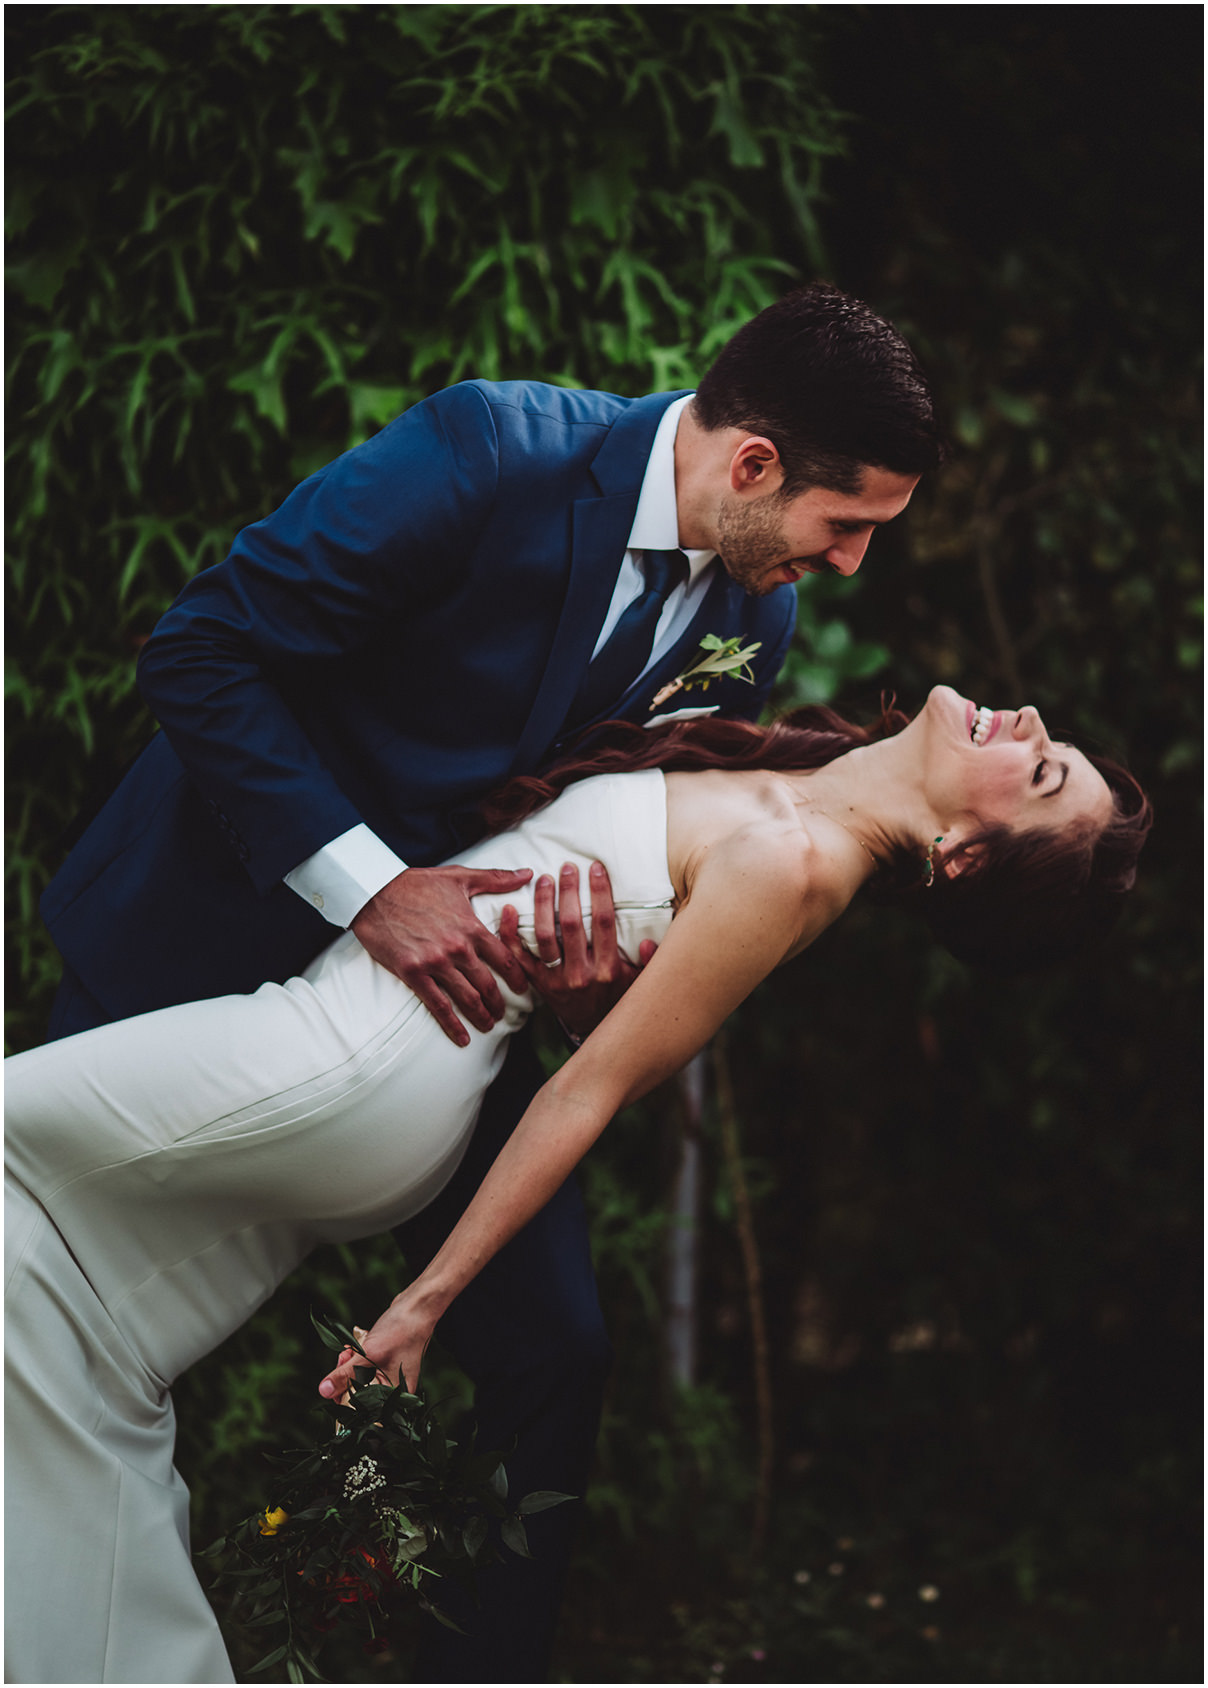 WEDDING-PHOTOGRAPHY-TUSCANY-SARA-LORENZONI-FOTOGRAFIA-MATRIMONIO-MELISSA-JOSHUA39